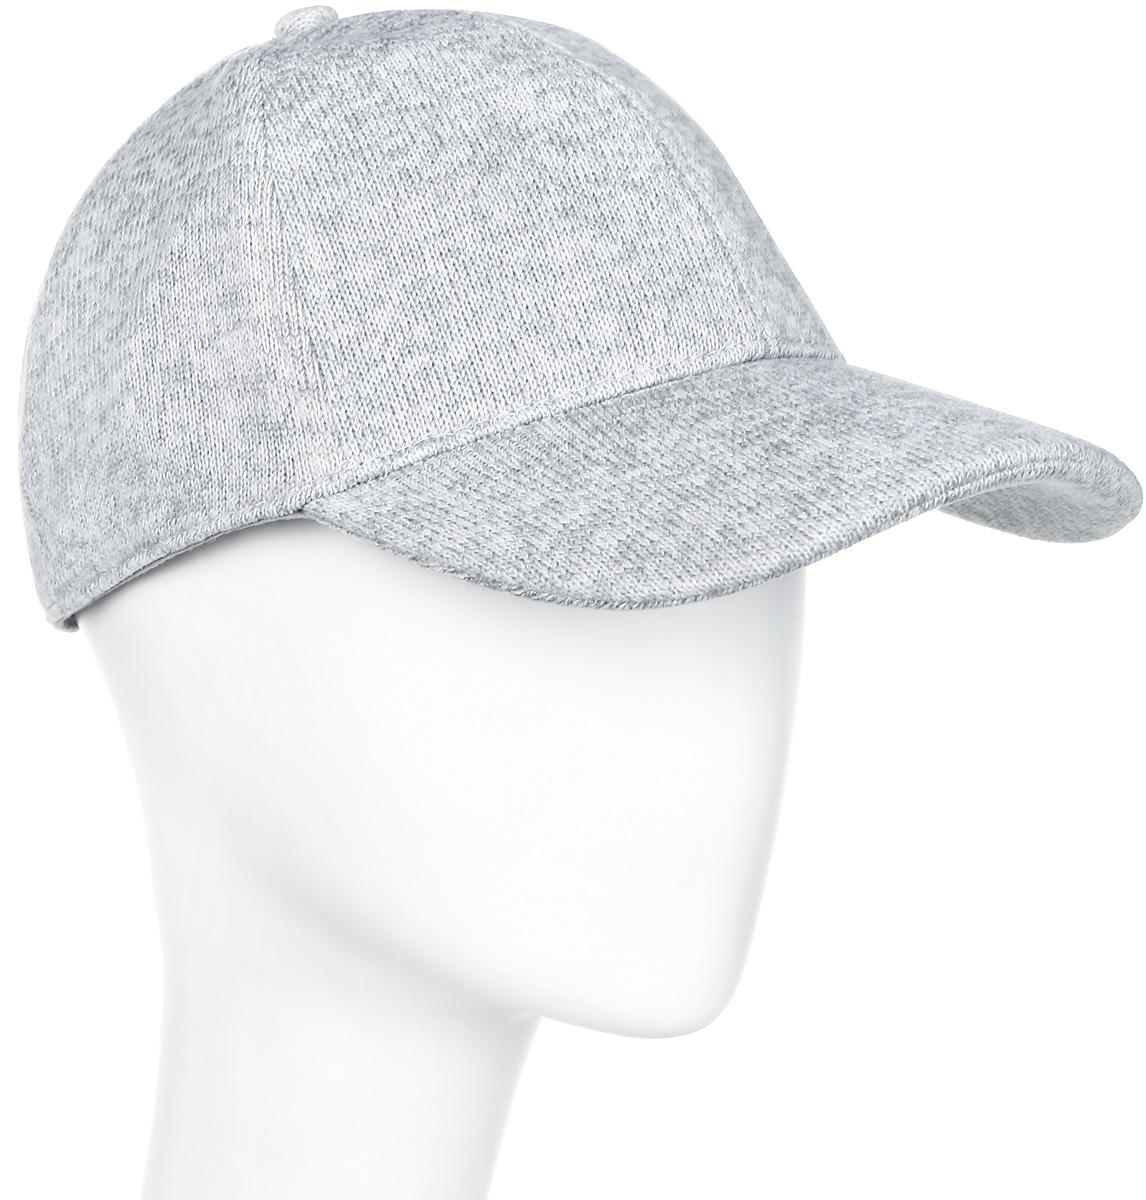 Бейсболка мужская Icepeak, цвет: серый, белый. 858827872IV-811. Размер универсальный858827872IV-811